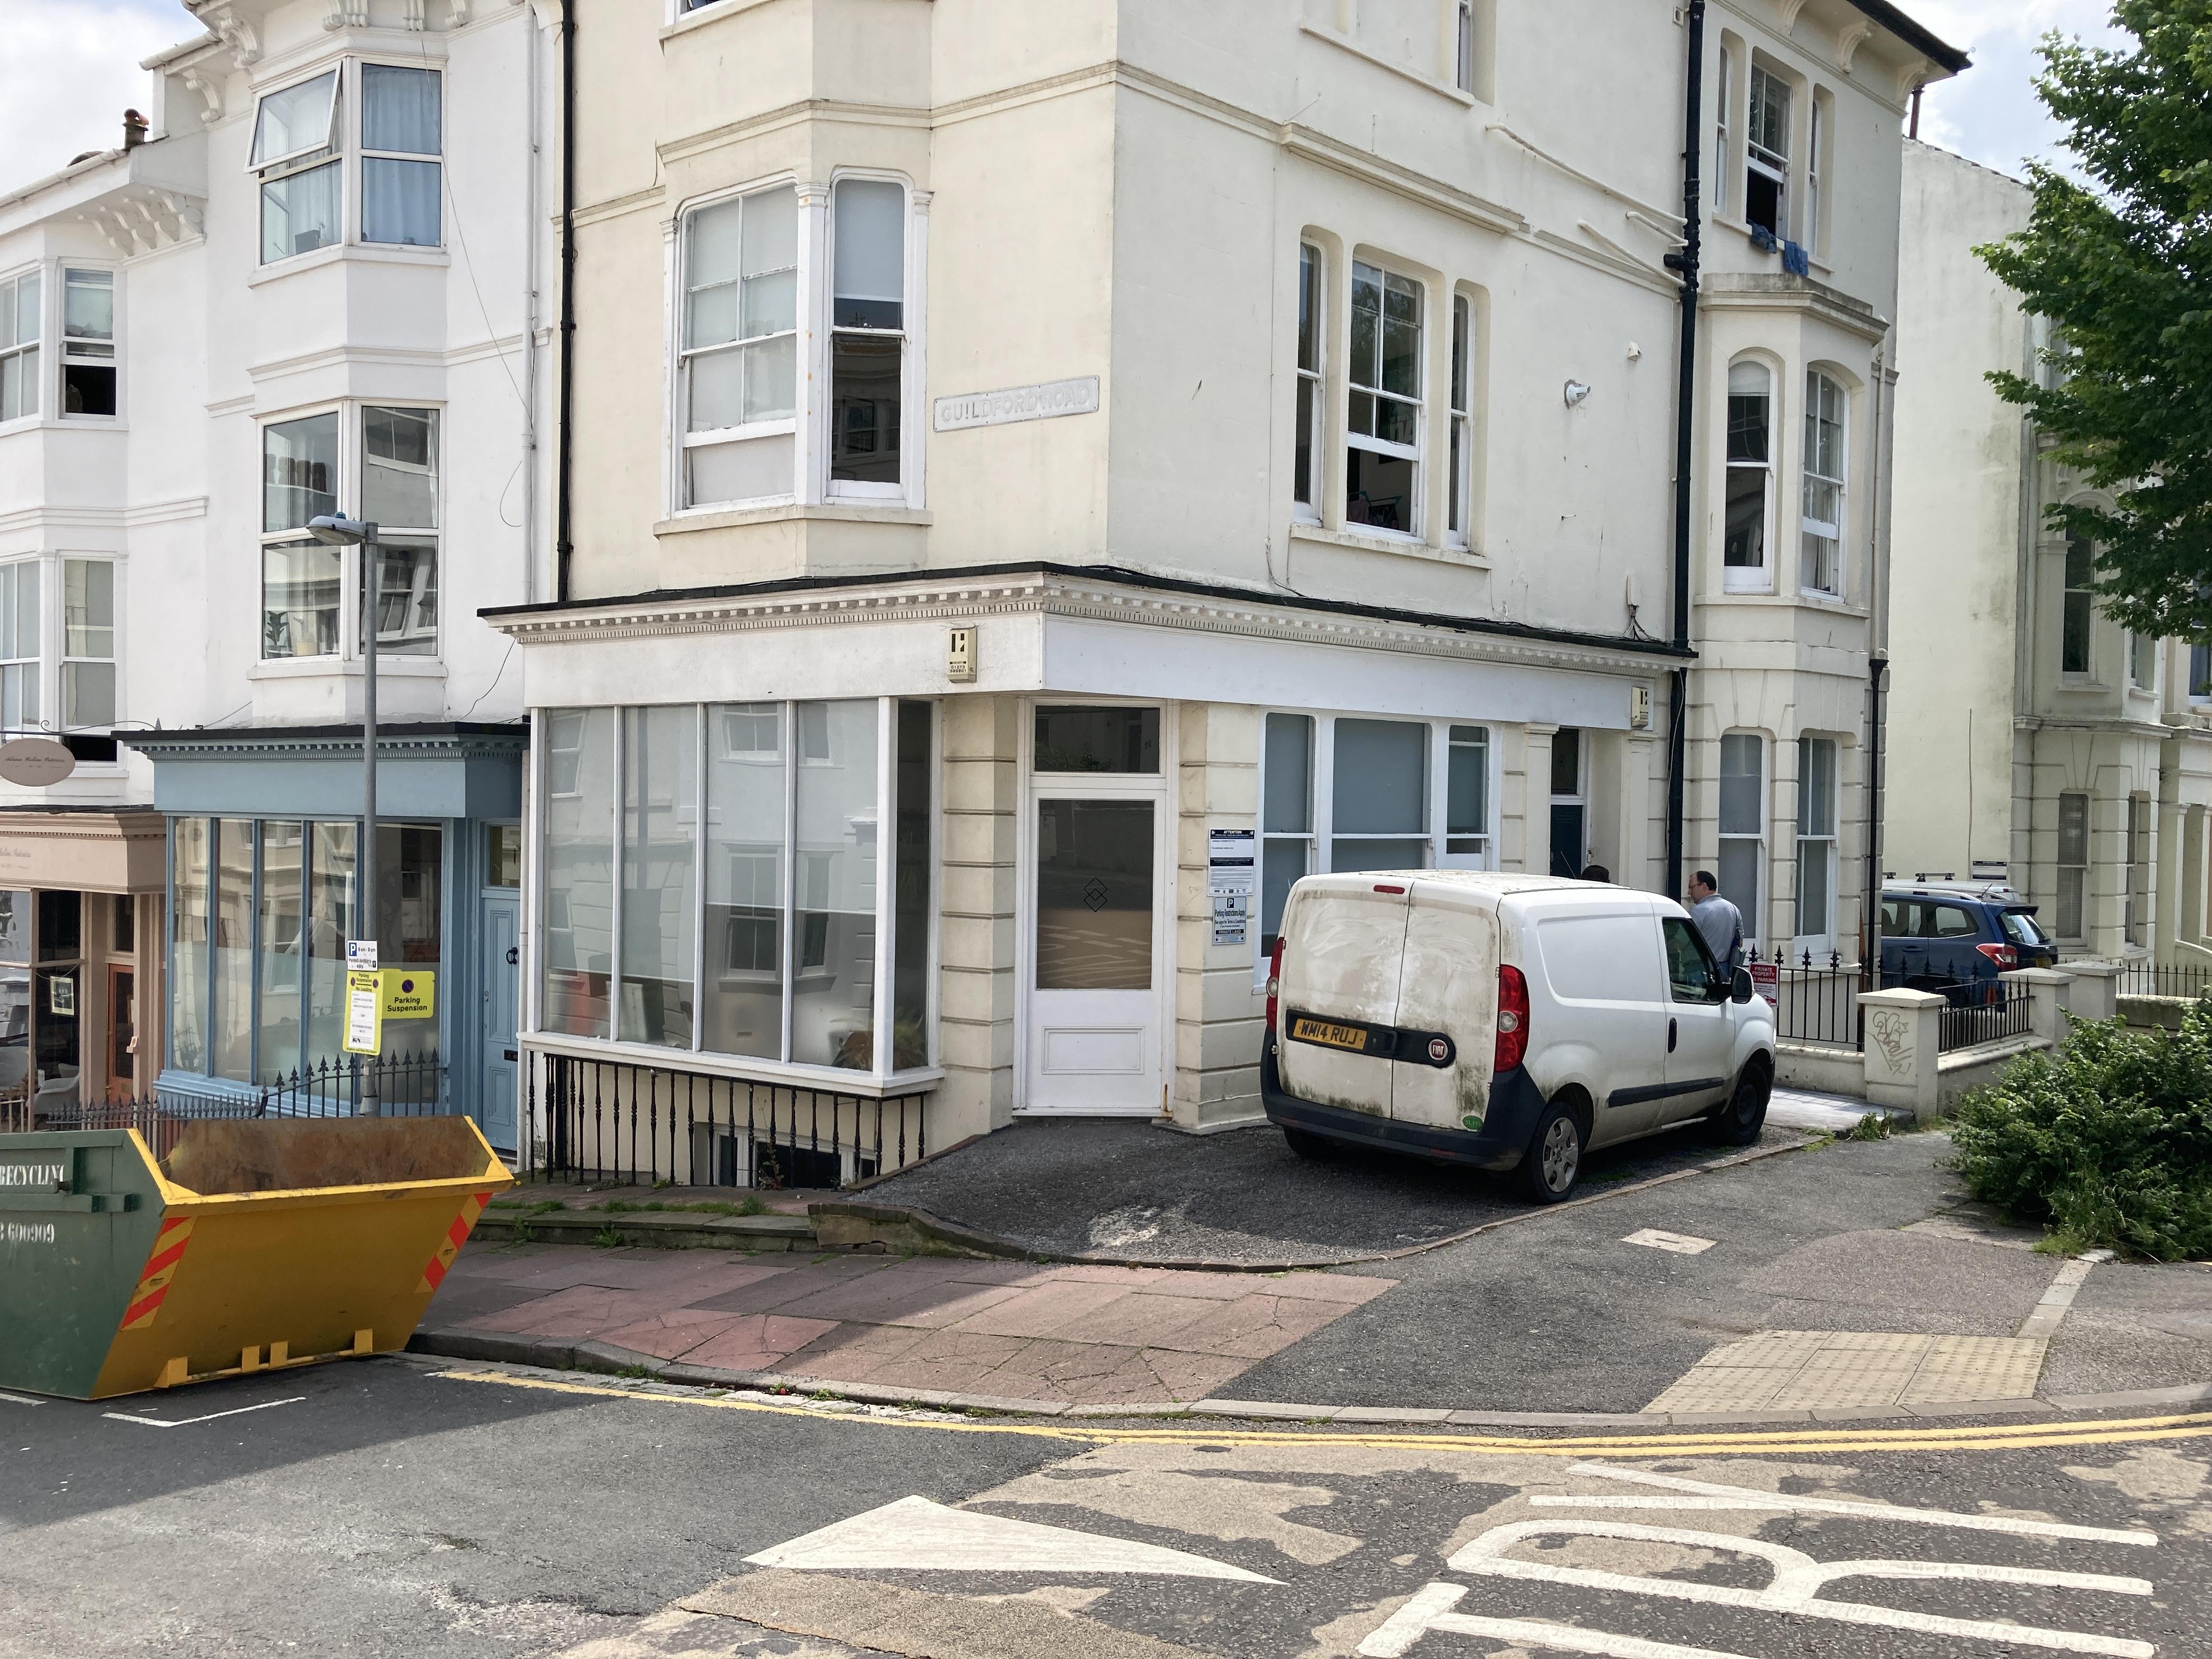 18 Guildford Road Brighton image.